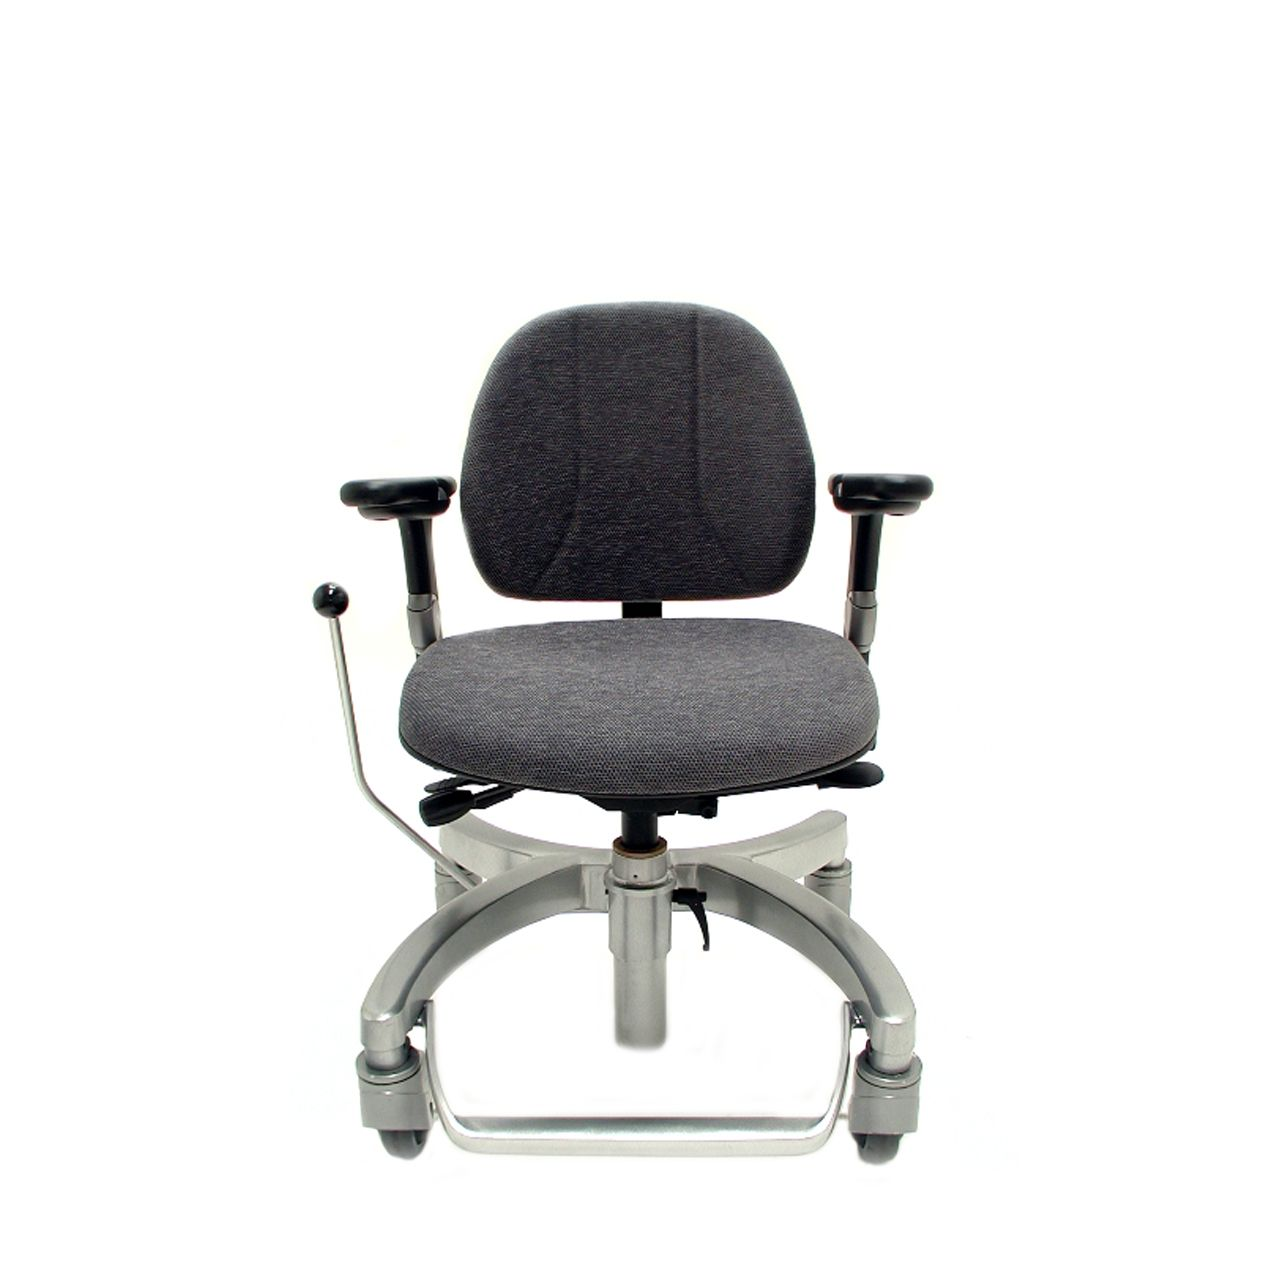 Hepro-gasso-standaard-trippelstoel-stkaaps002_0001_voorkant